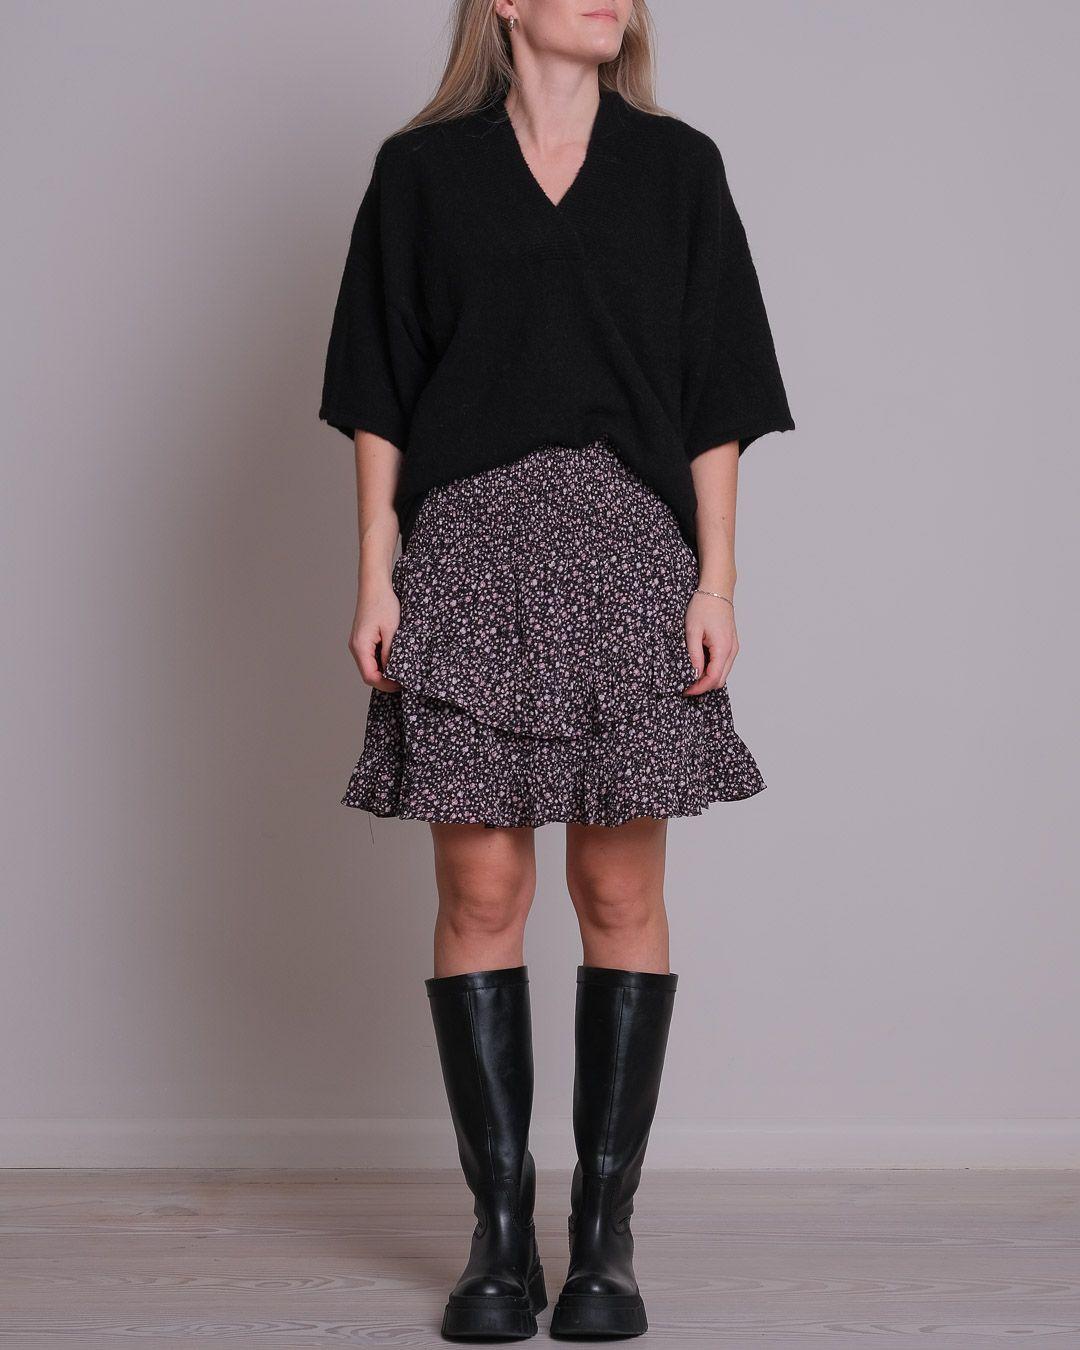 Neo Noir Line Eden nederdel, black, x-small